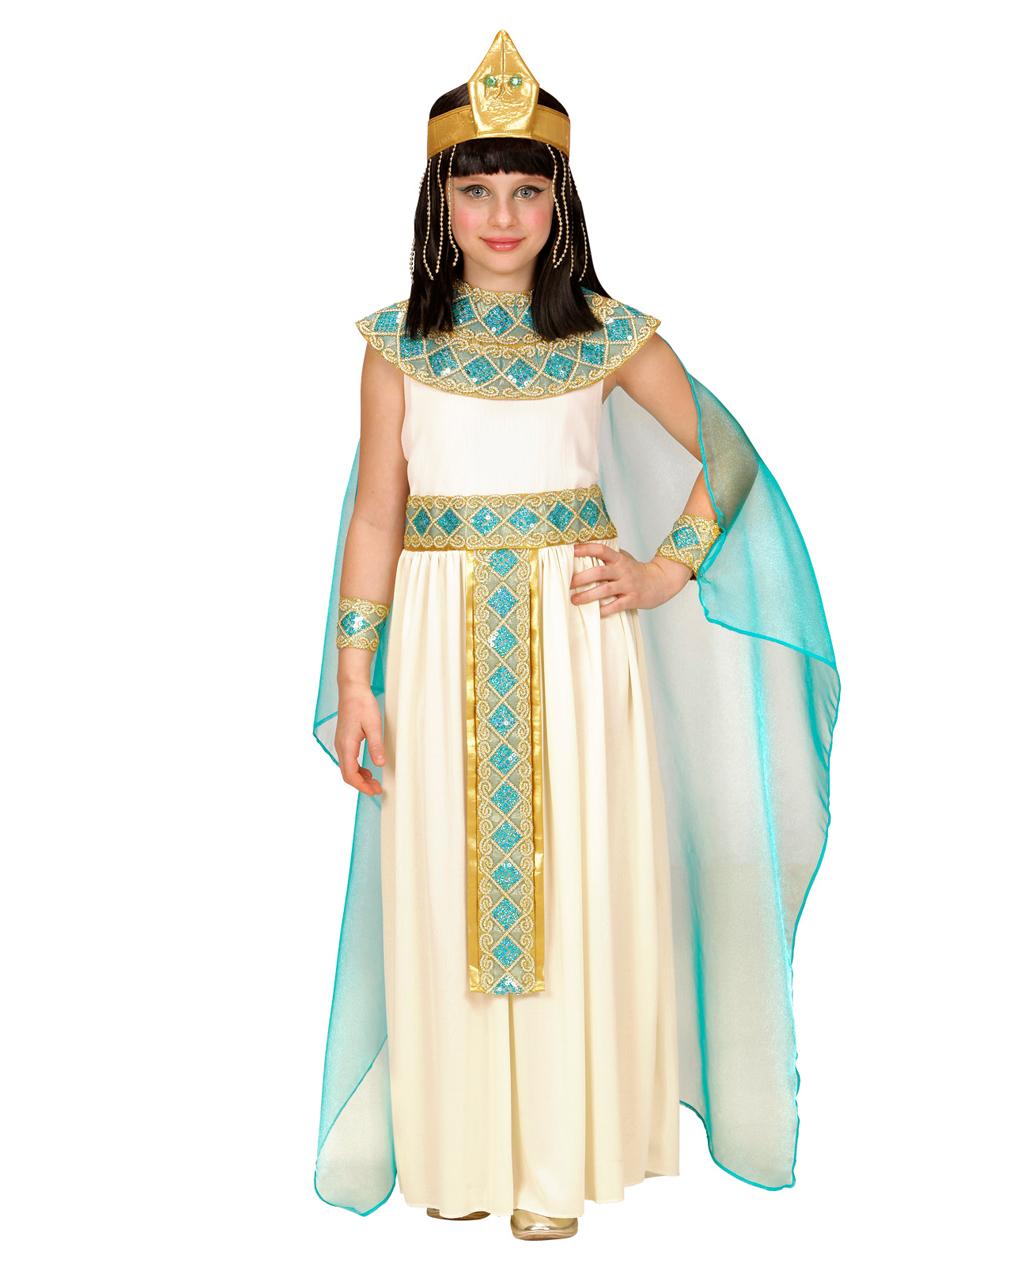 4 Piece Cleopatra Child Costume Deluxe Order Horror Shop Com